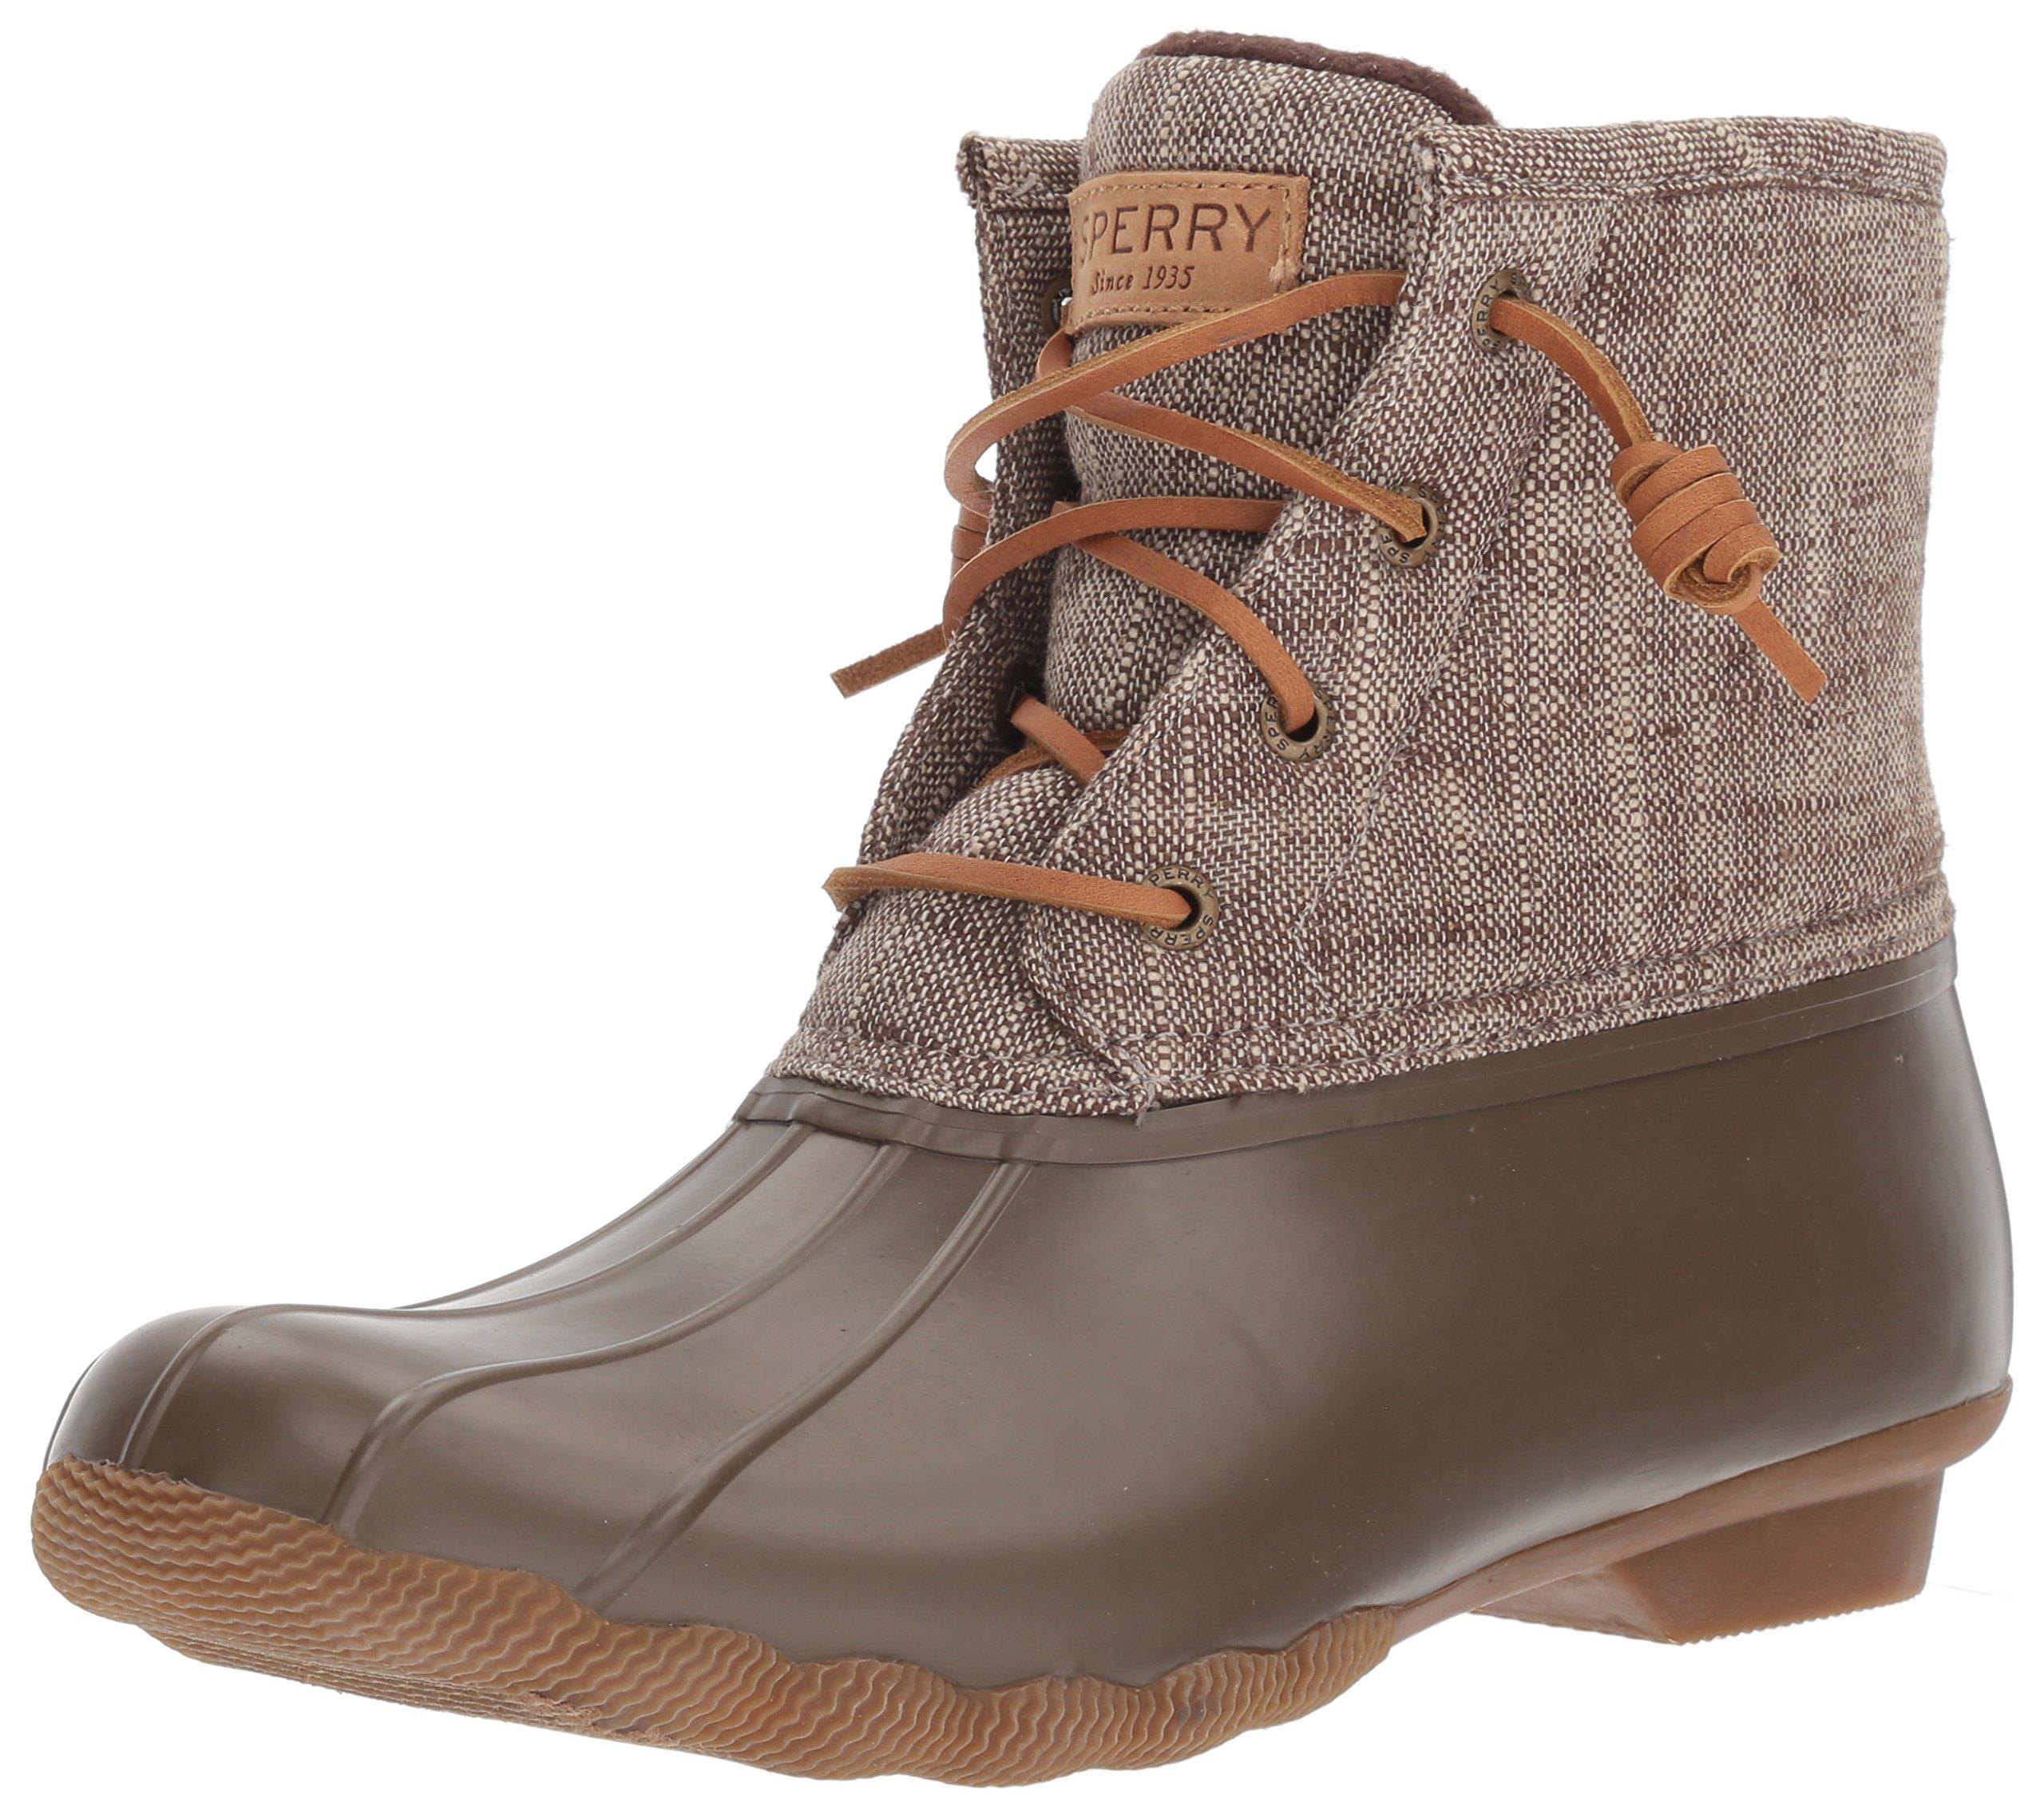 Sperry Top-Sider Women's Saltwater Heavy Linen Rain Boot, Olive, 12 Medium US